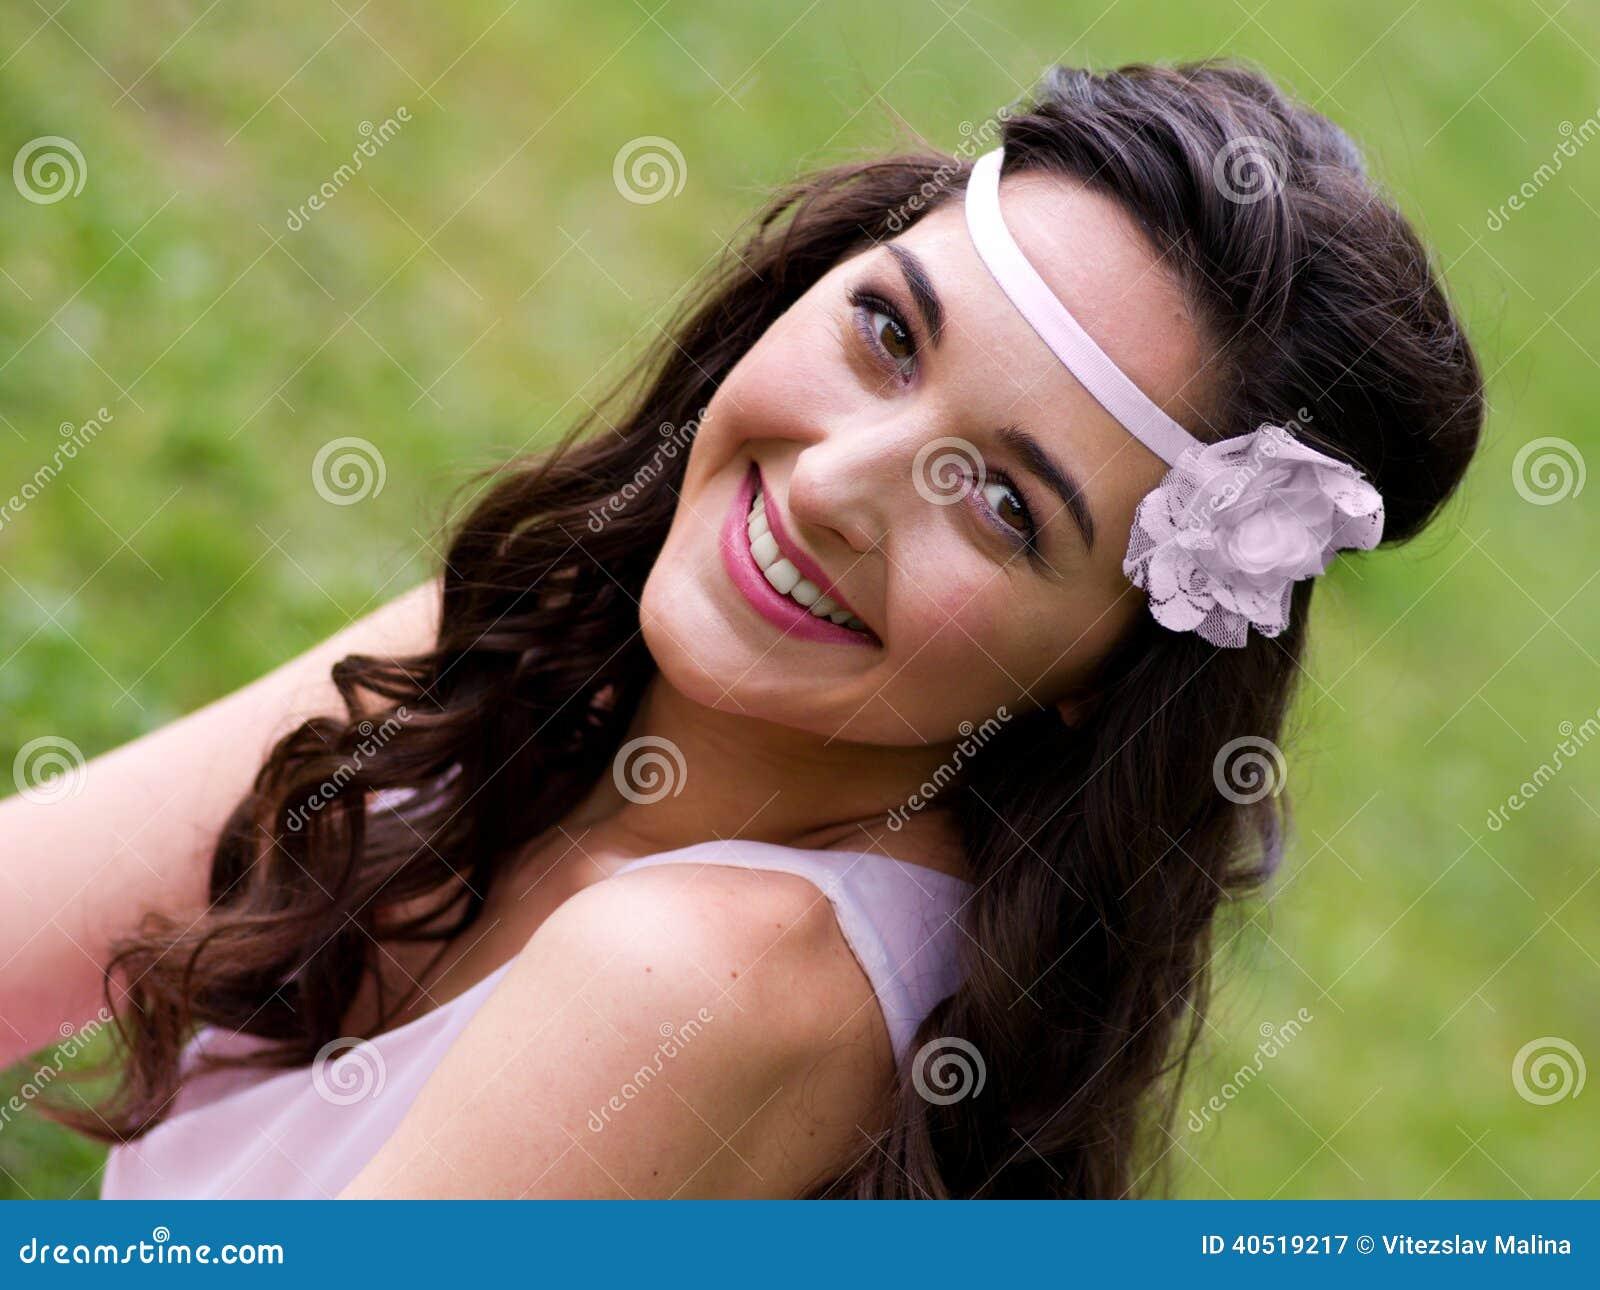 Australian beautiful girl image-9568